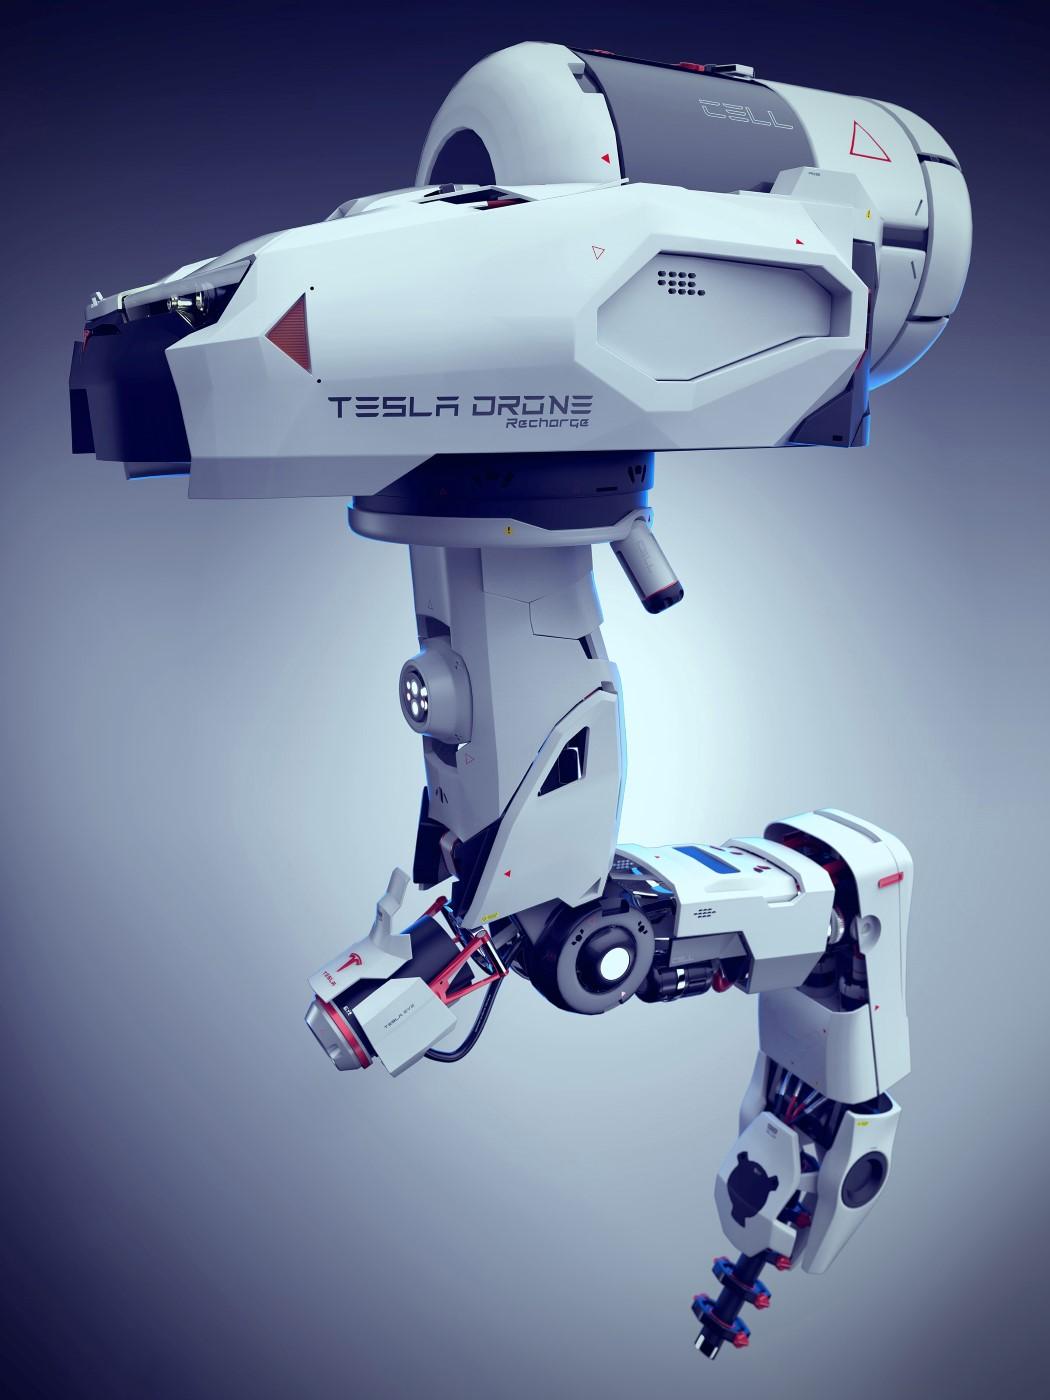 tesla_charging_drone_5